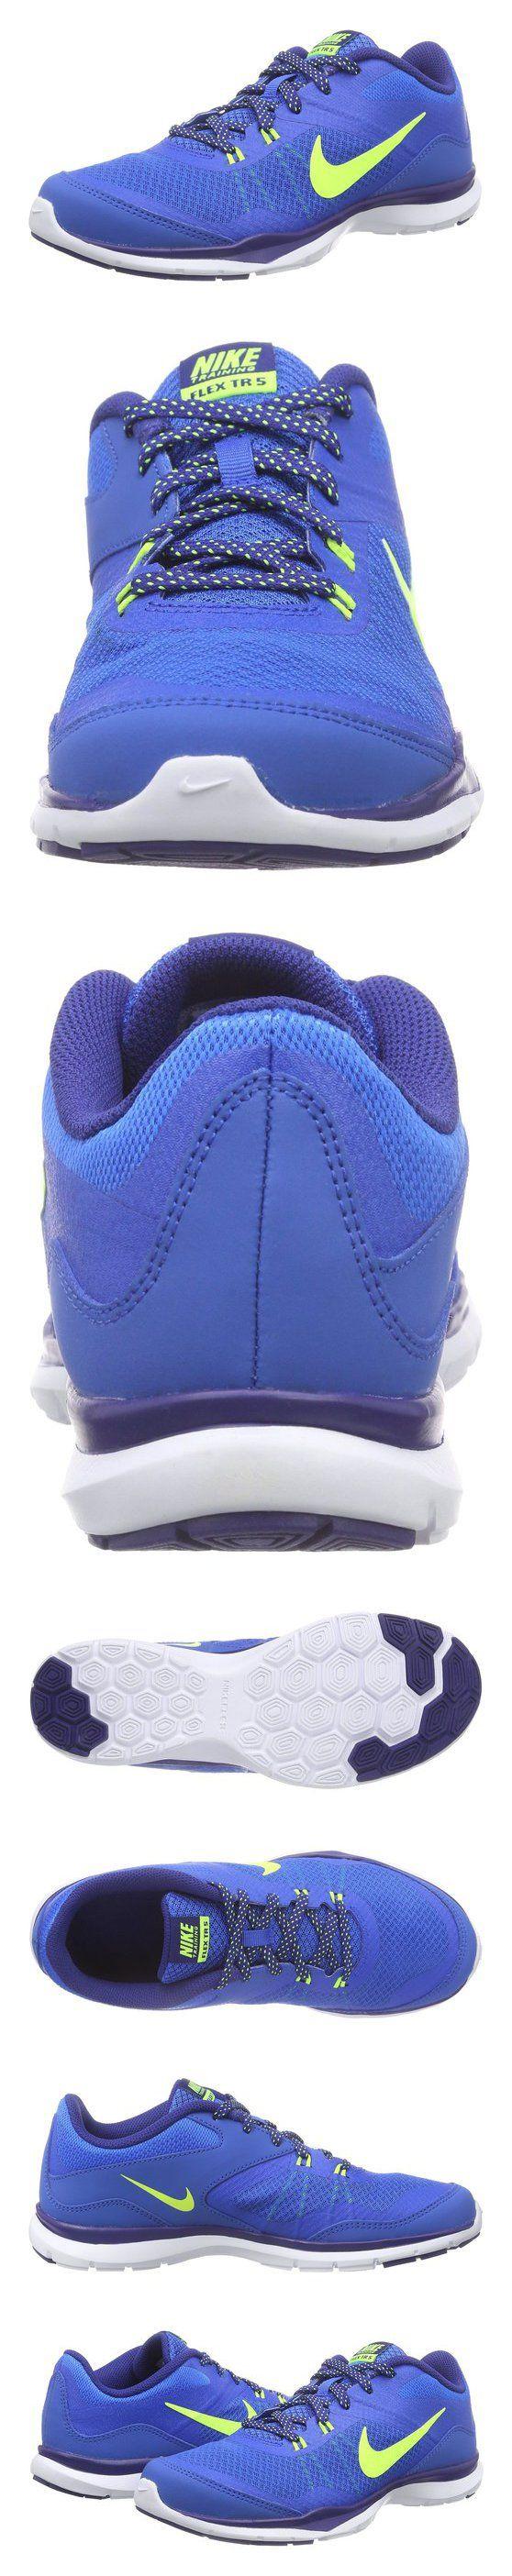 $70 - Nike Women's Flex Trainer 5 Soar/Volt/Dp Royal/Blue/White Training Shoe 9 Women US #shoes #nike #2015